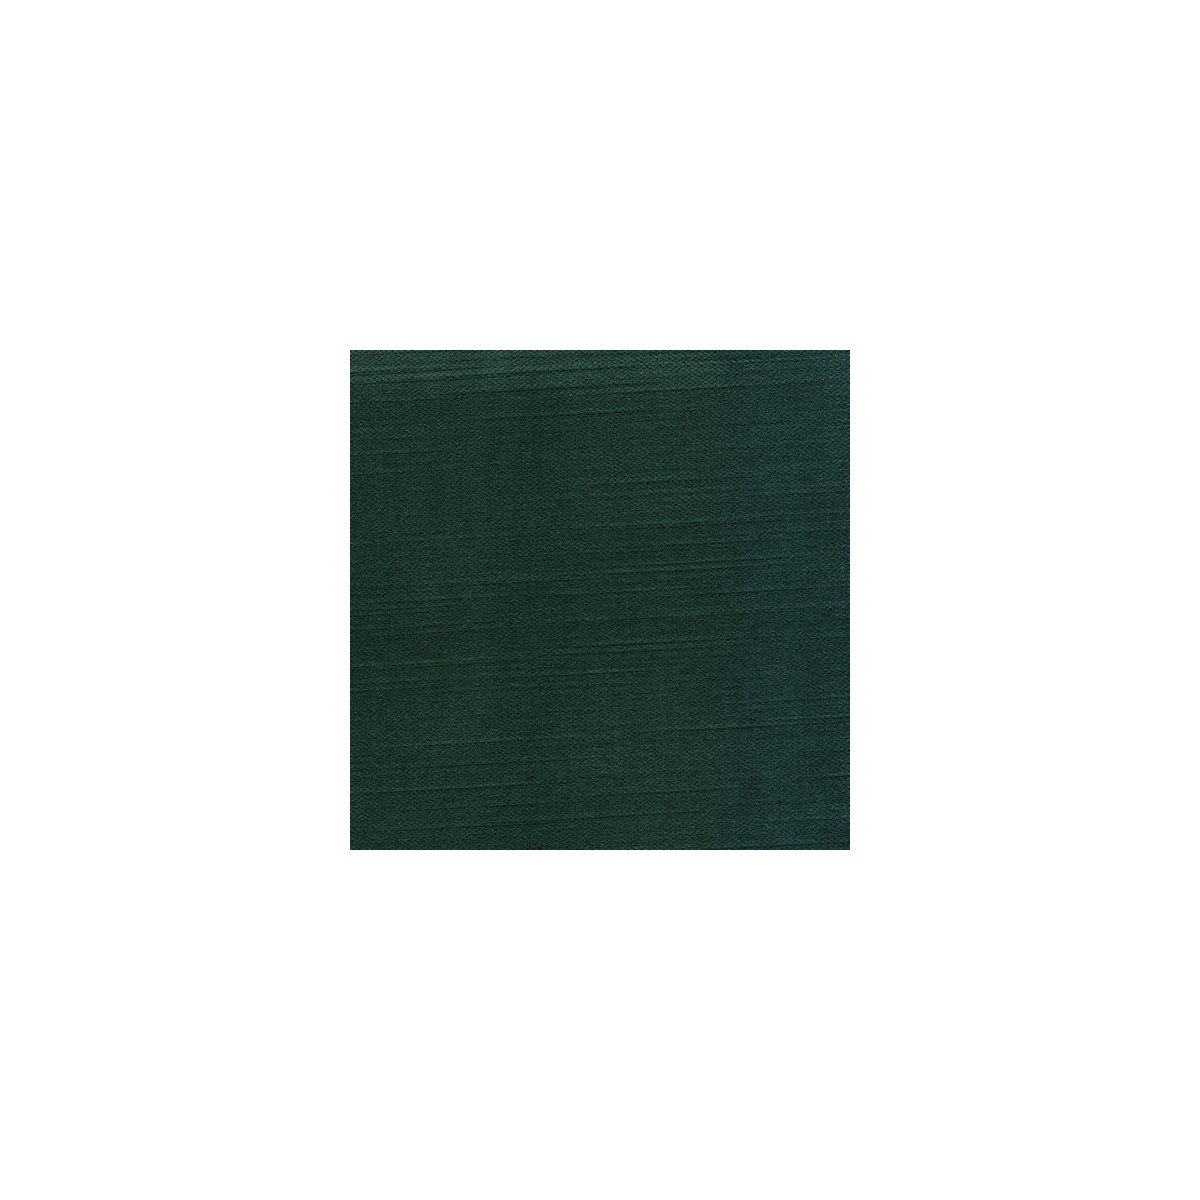 Caldwell  - Cypress - Fabric By the Yard